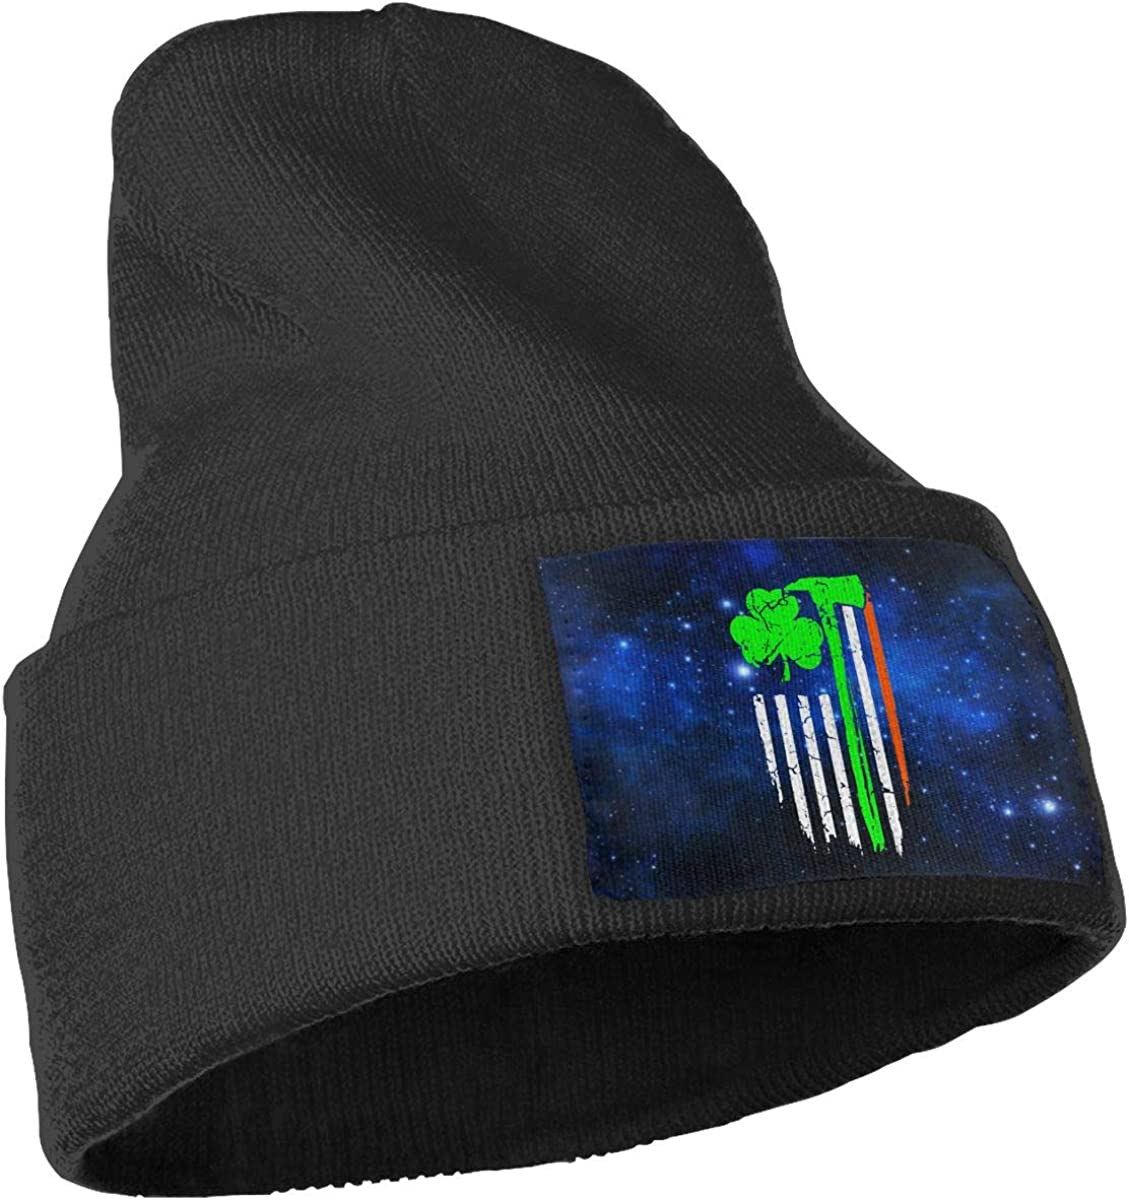 COLLJL-8 Men//Women Irish Firefighter Flag Outdoor Fashion Knit Beanies Hat Soft Winter Knit Caps